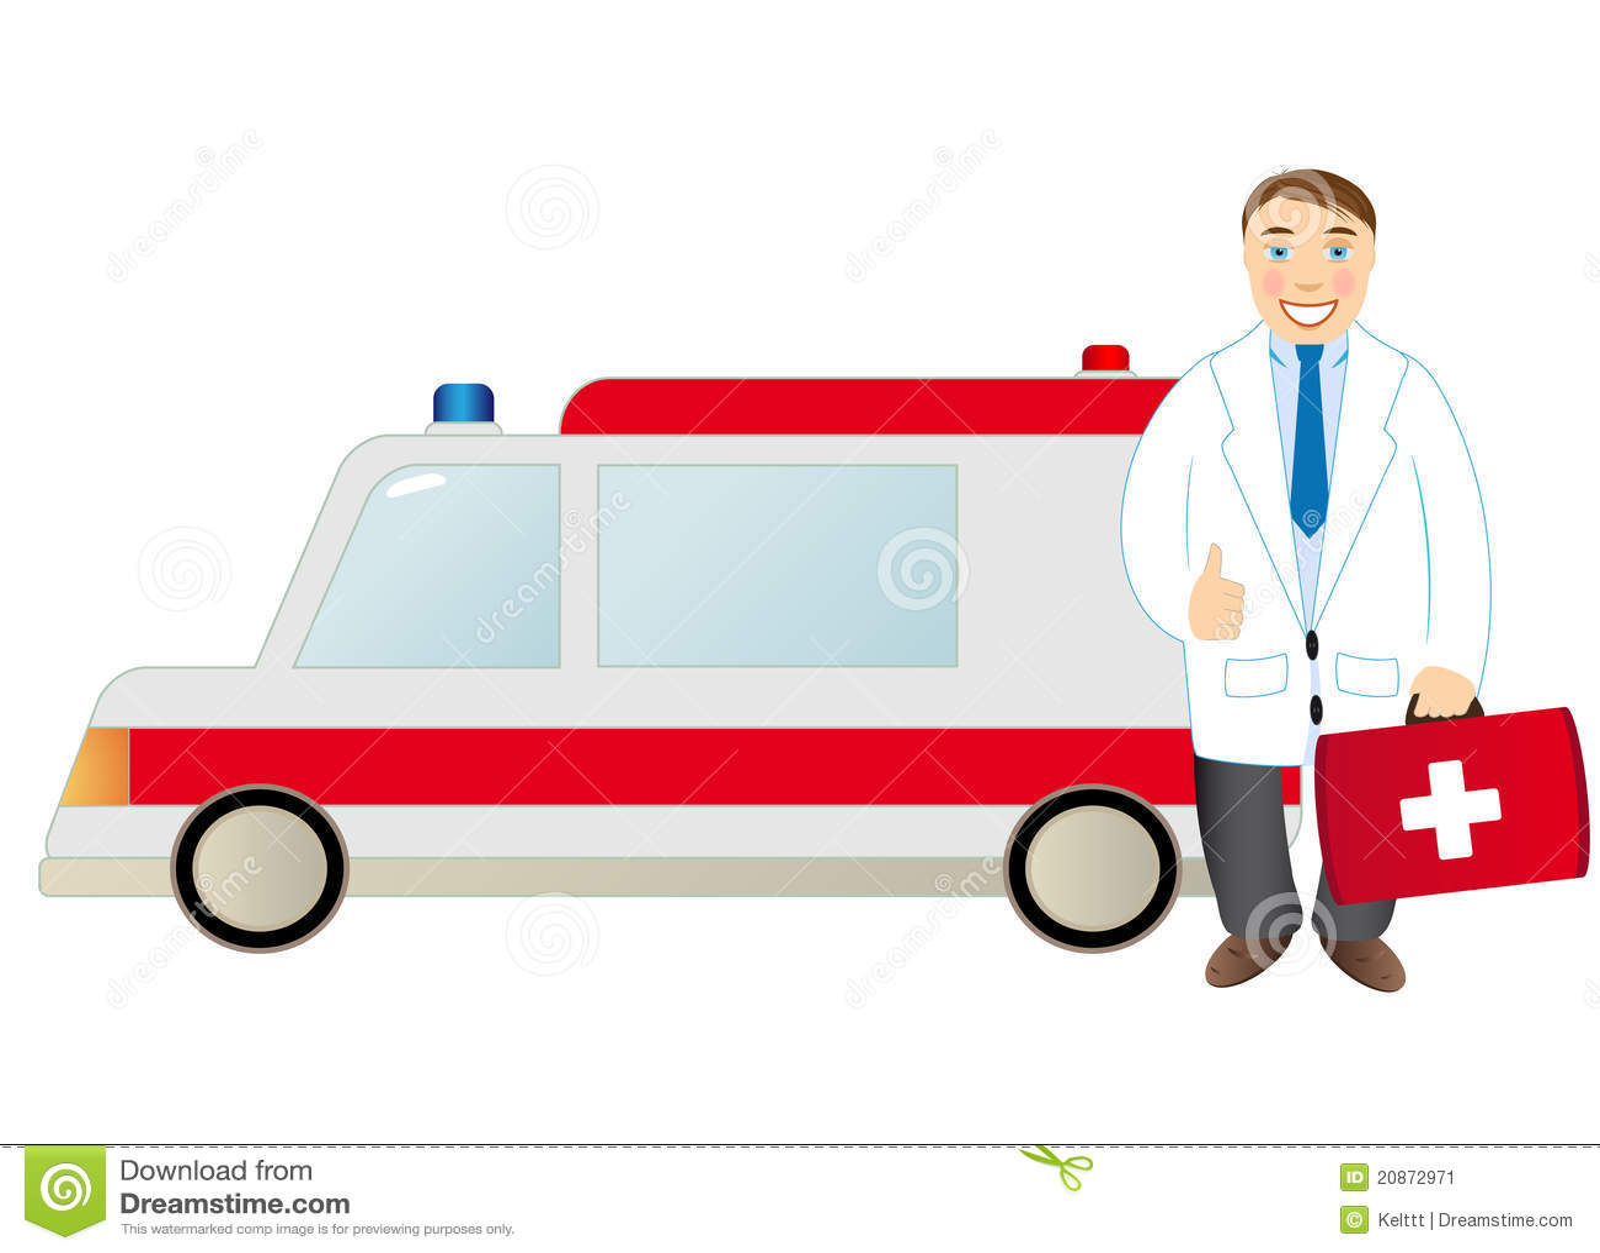 Картинки врача скорой помощи для детей